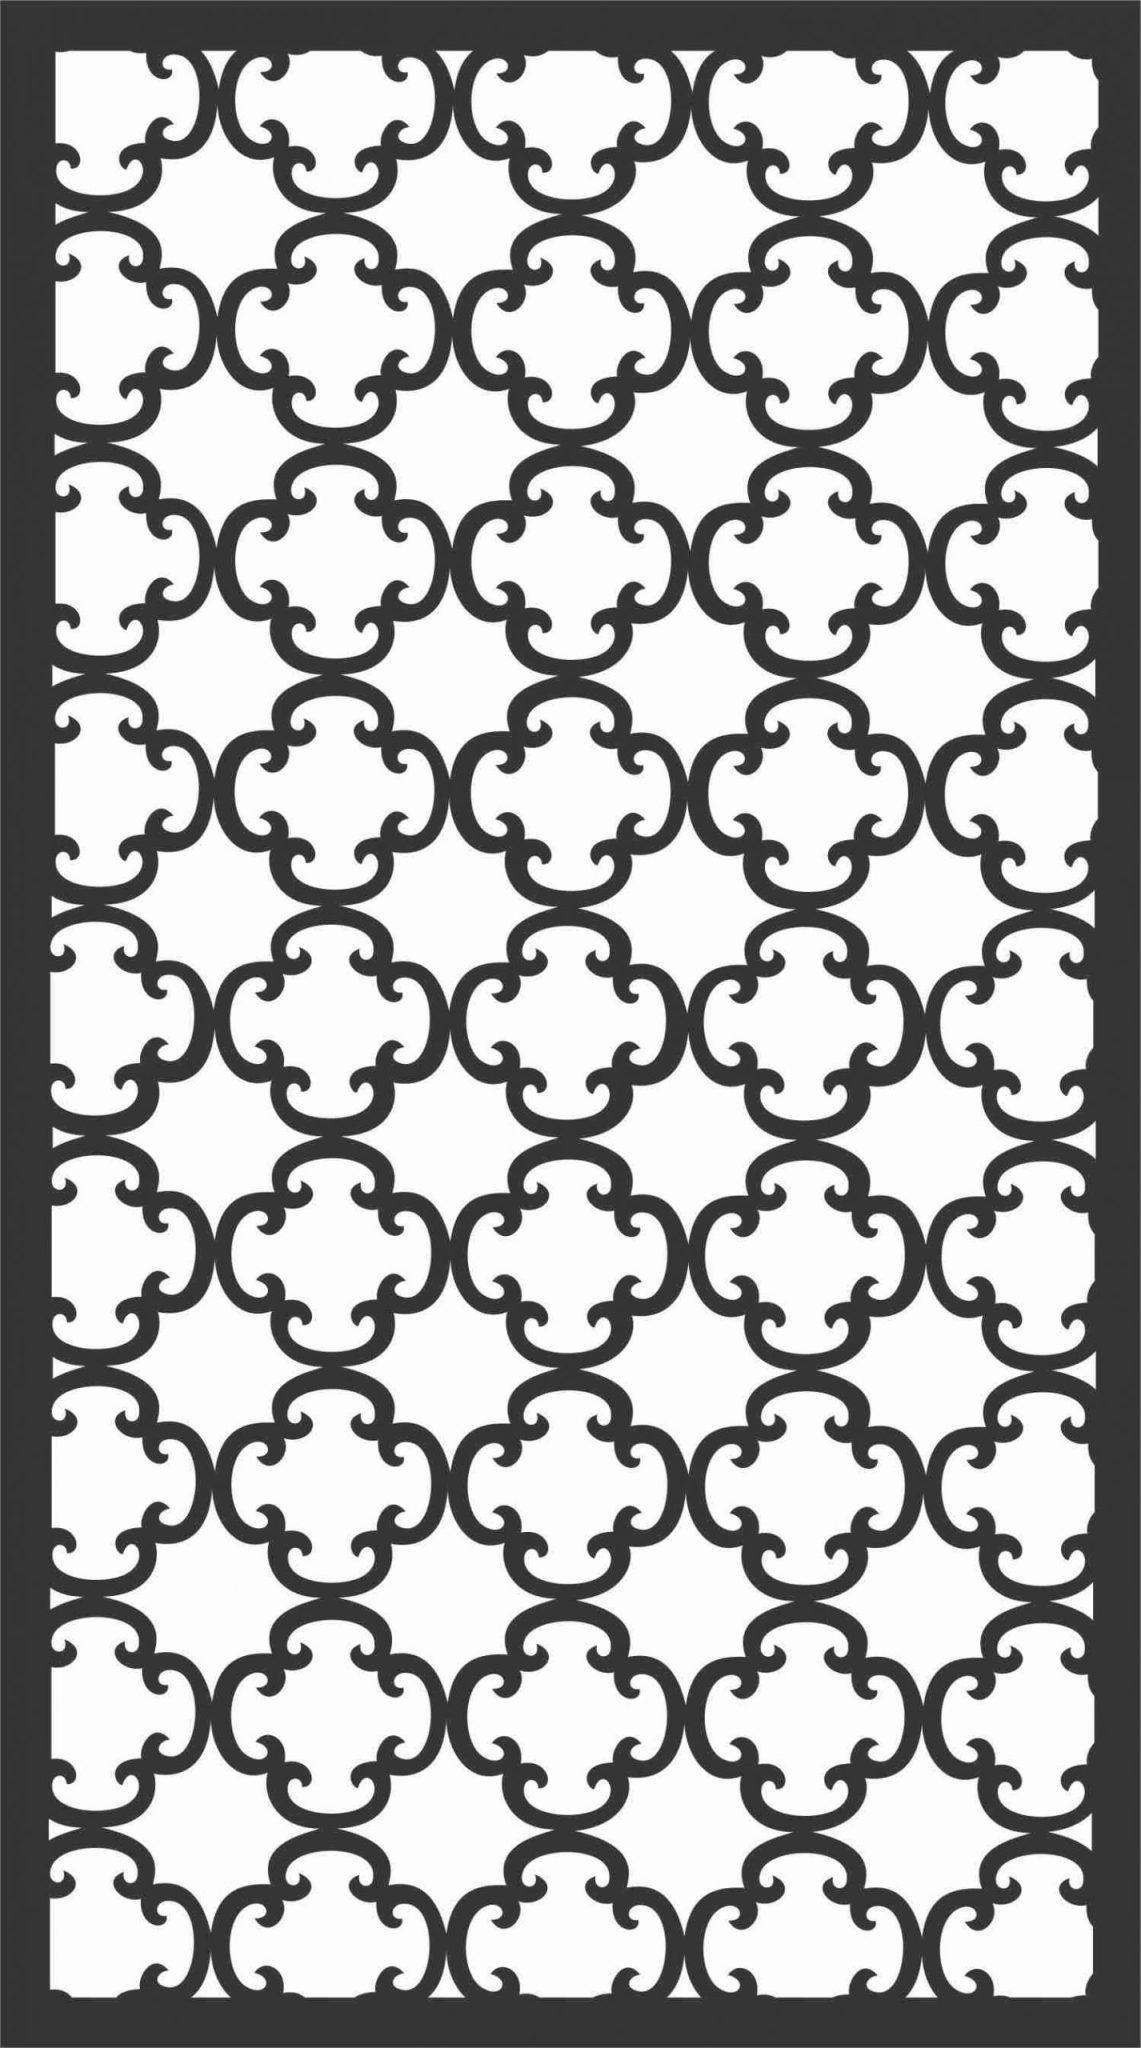 Screen Panel Patterns Seamless 22 Free DXF File